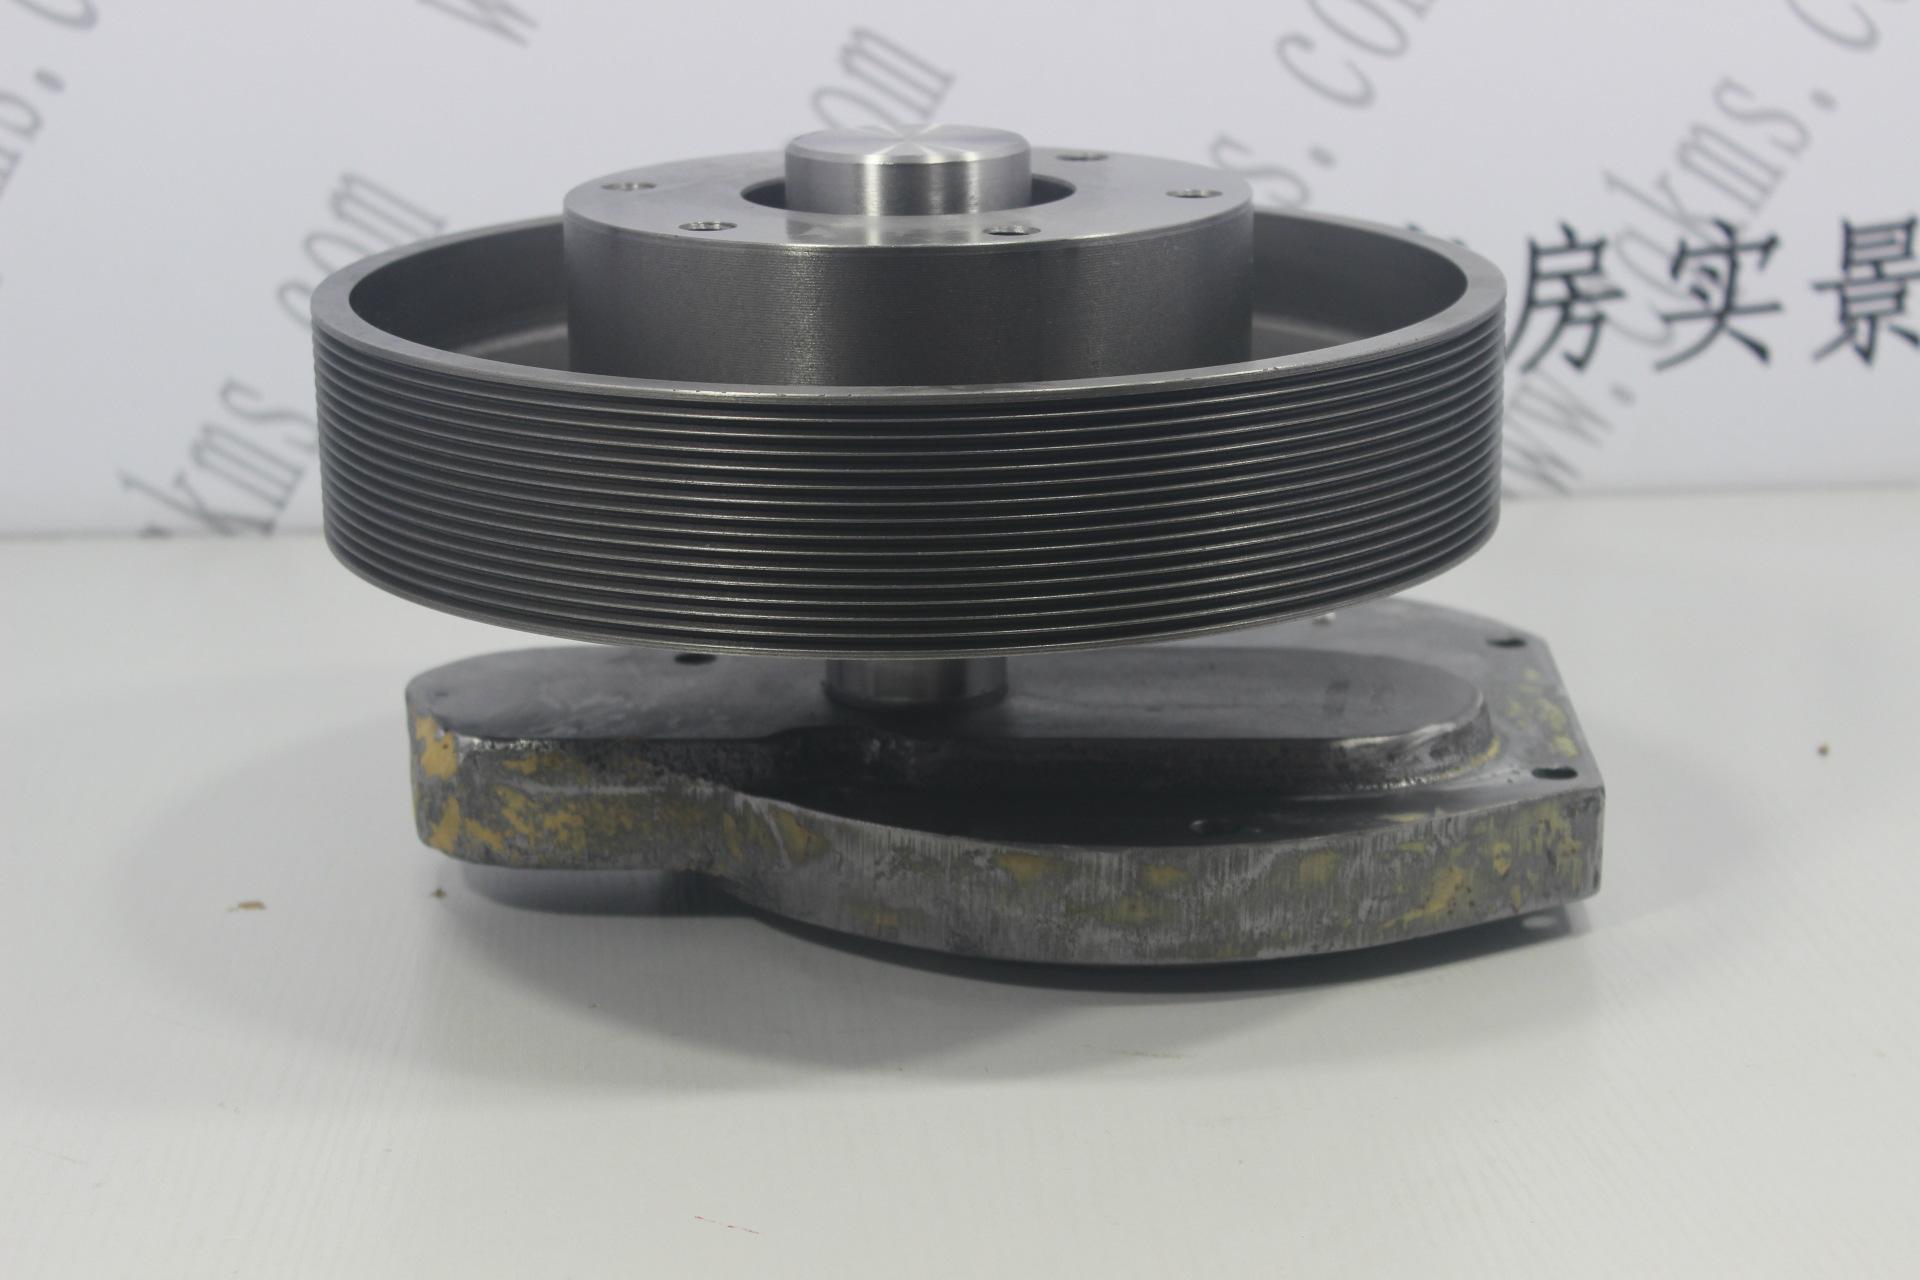 kms06482-3002230-风扇轮毂总成图片4